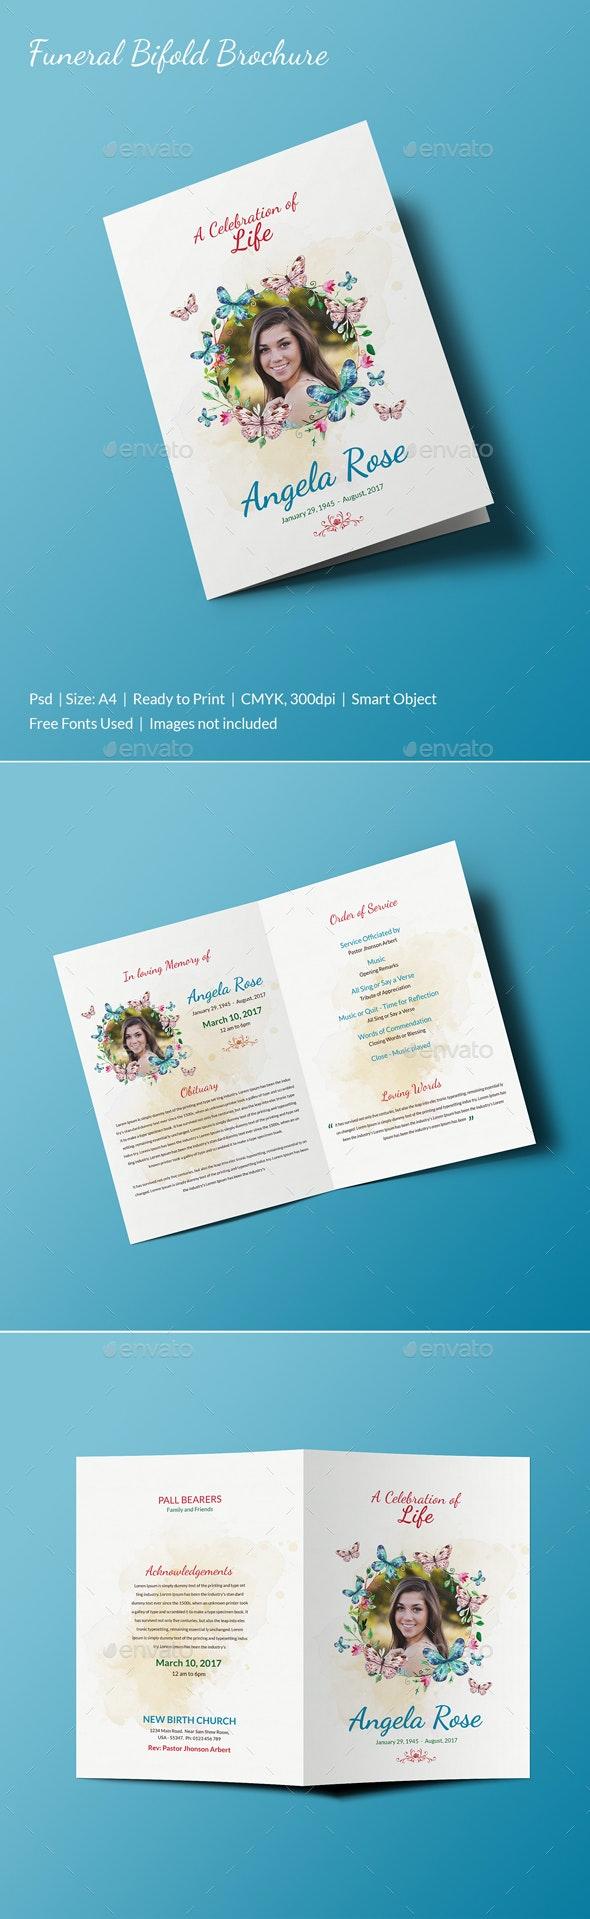 Funeral Brochure - Print Templates